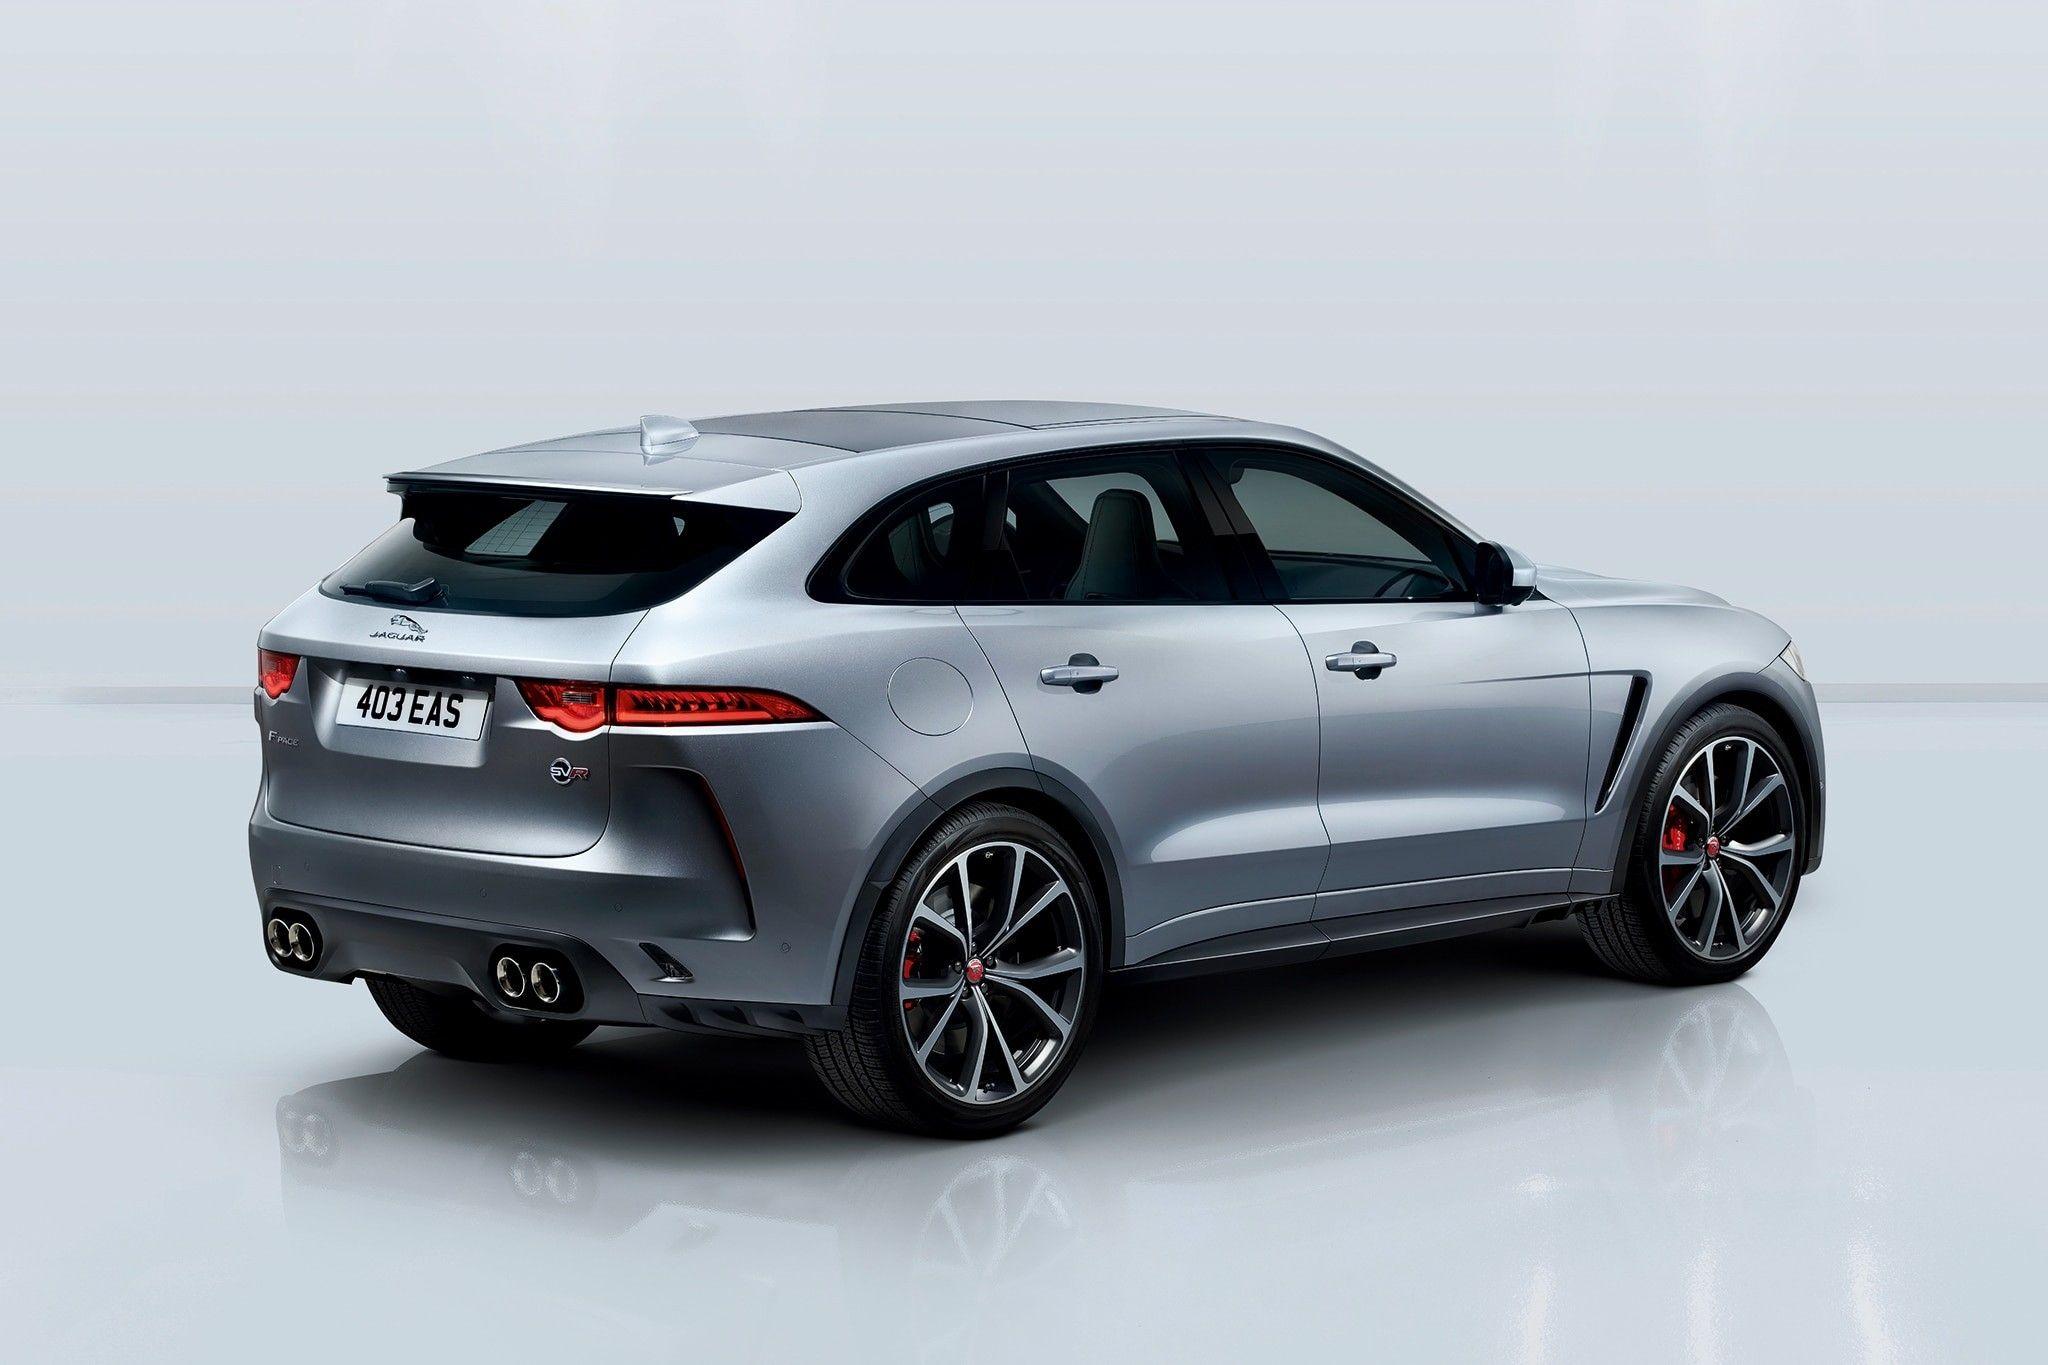 The 2019 Jaguar F Type Msrp Redesign And Price Jaguar Suv